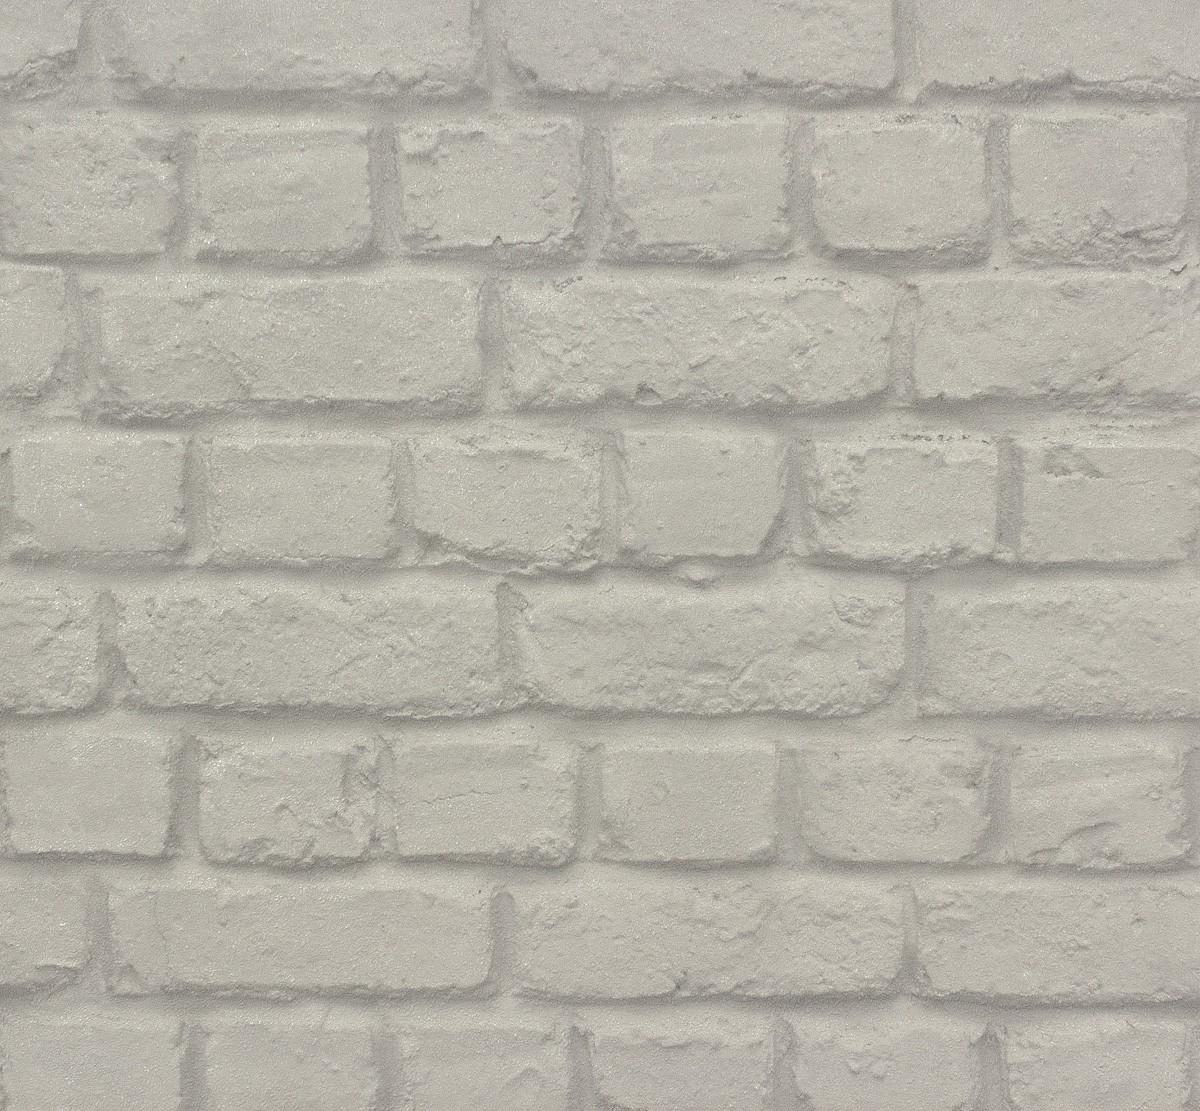 Rasch non woven wallpaper 587227 kids teens stone optic - Steintapete beige ...